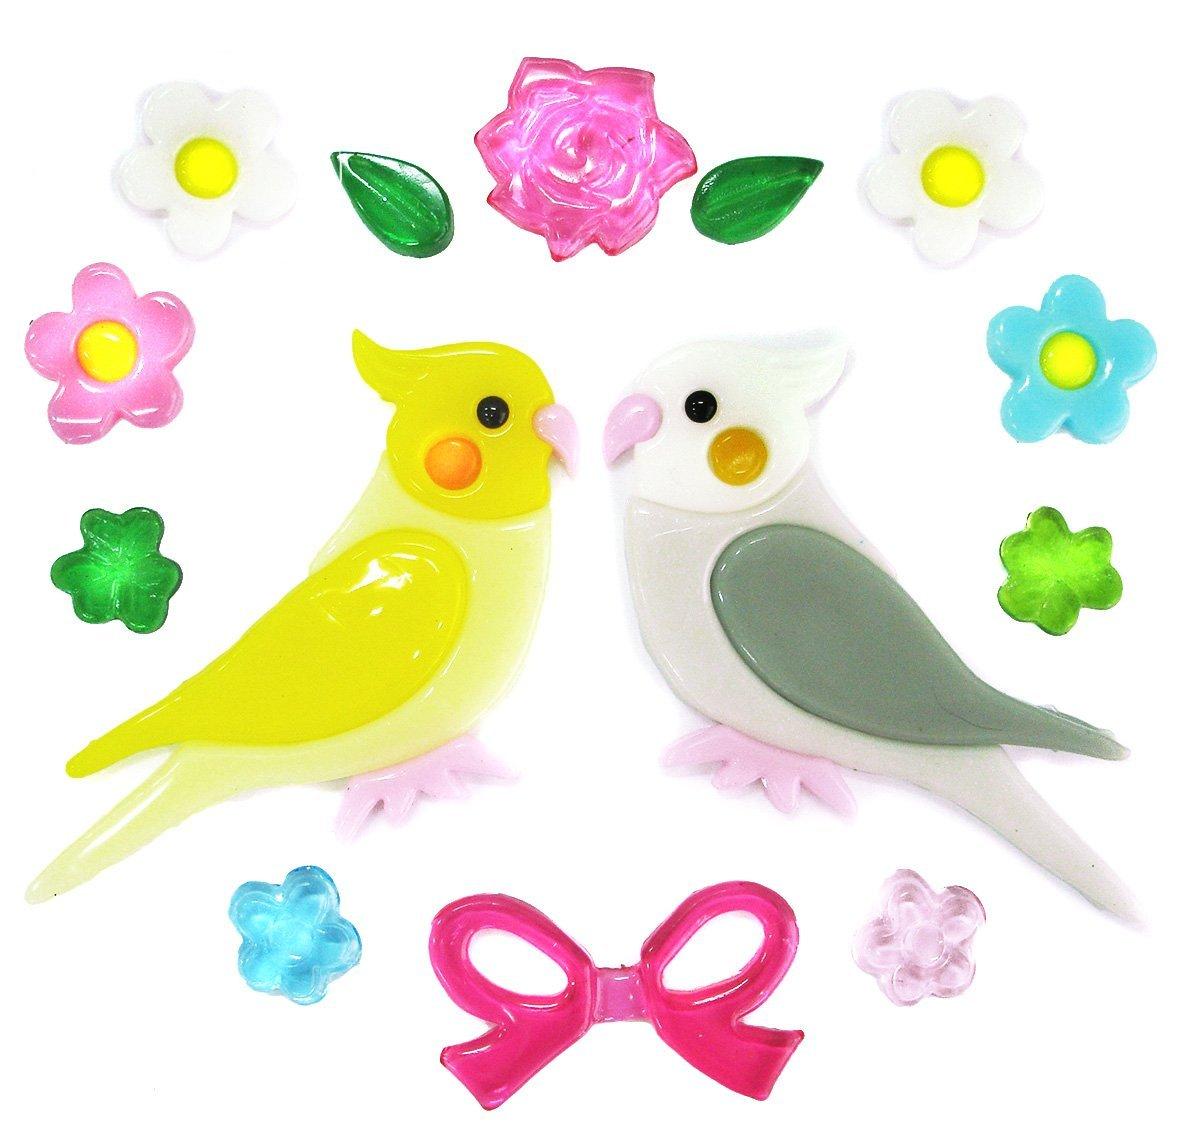 Outlook Design Gel Gems Uccellini Birdies Ag00, Sticker Gel Decorativo Attacca e Stacca per Finestre e Superfici Liscie, Sacchetto Small 20 X 20 Cm V2TSS0AG00